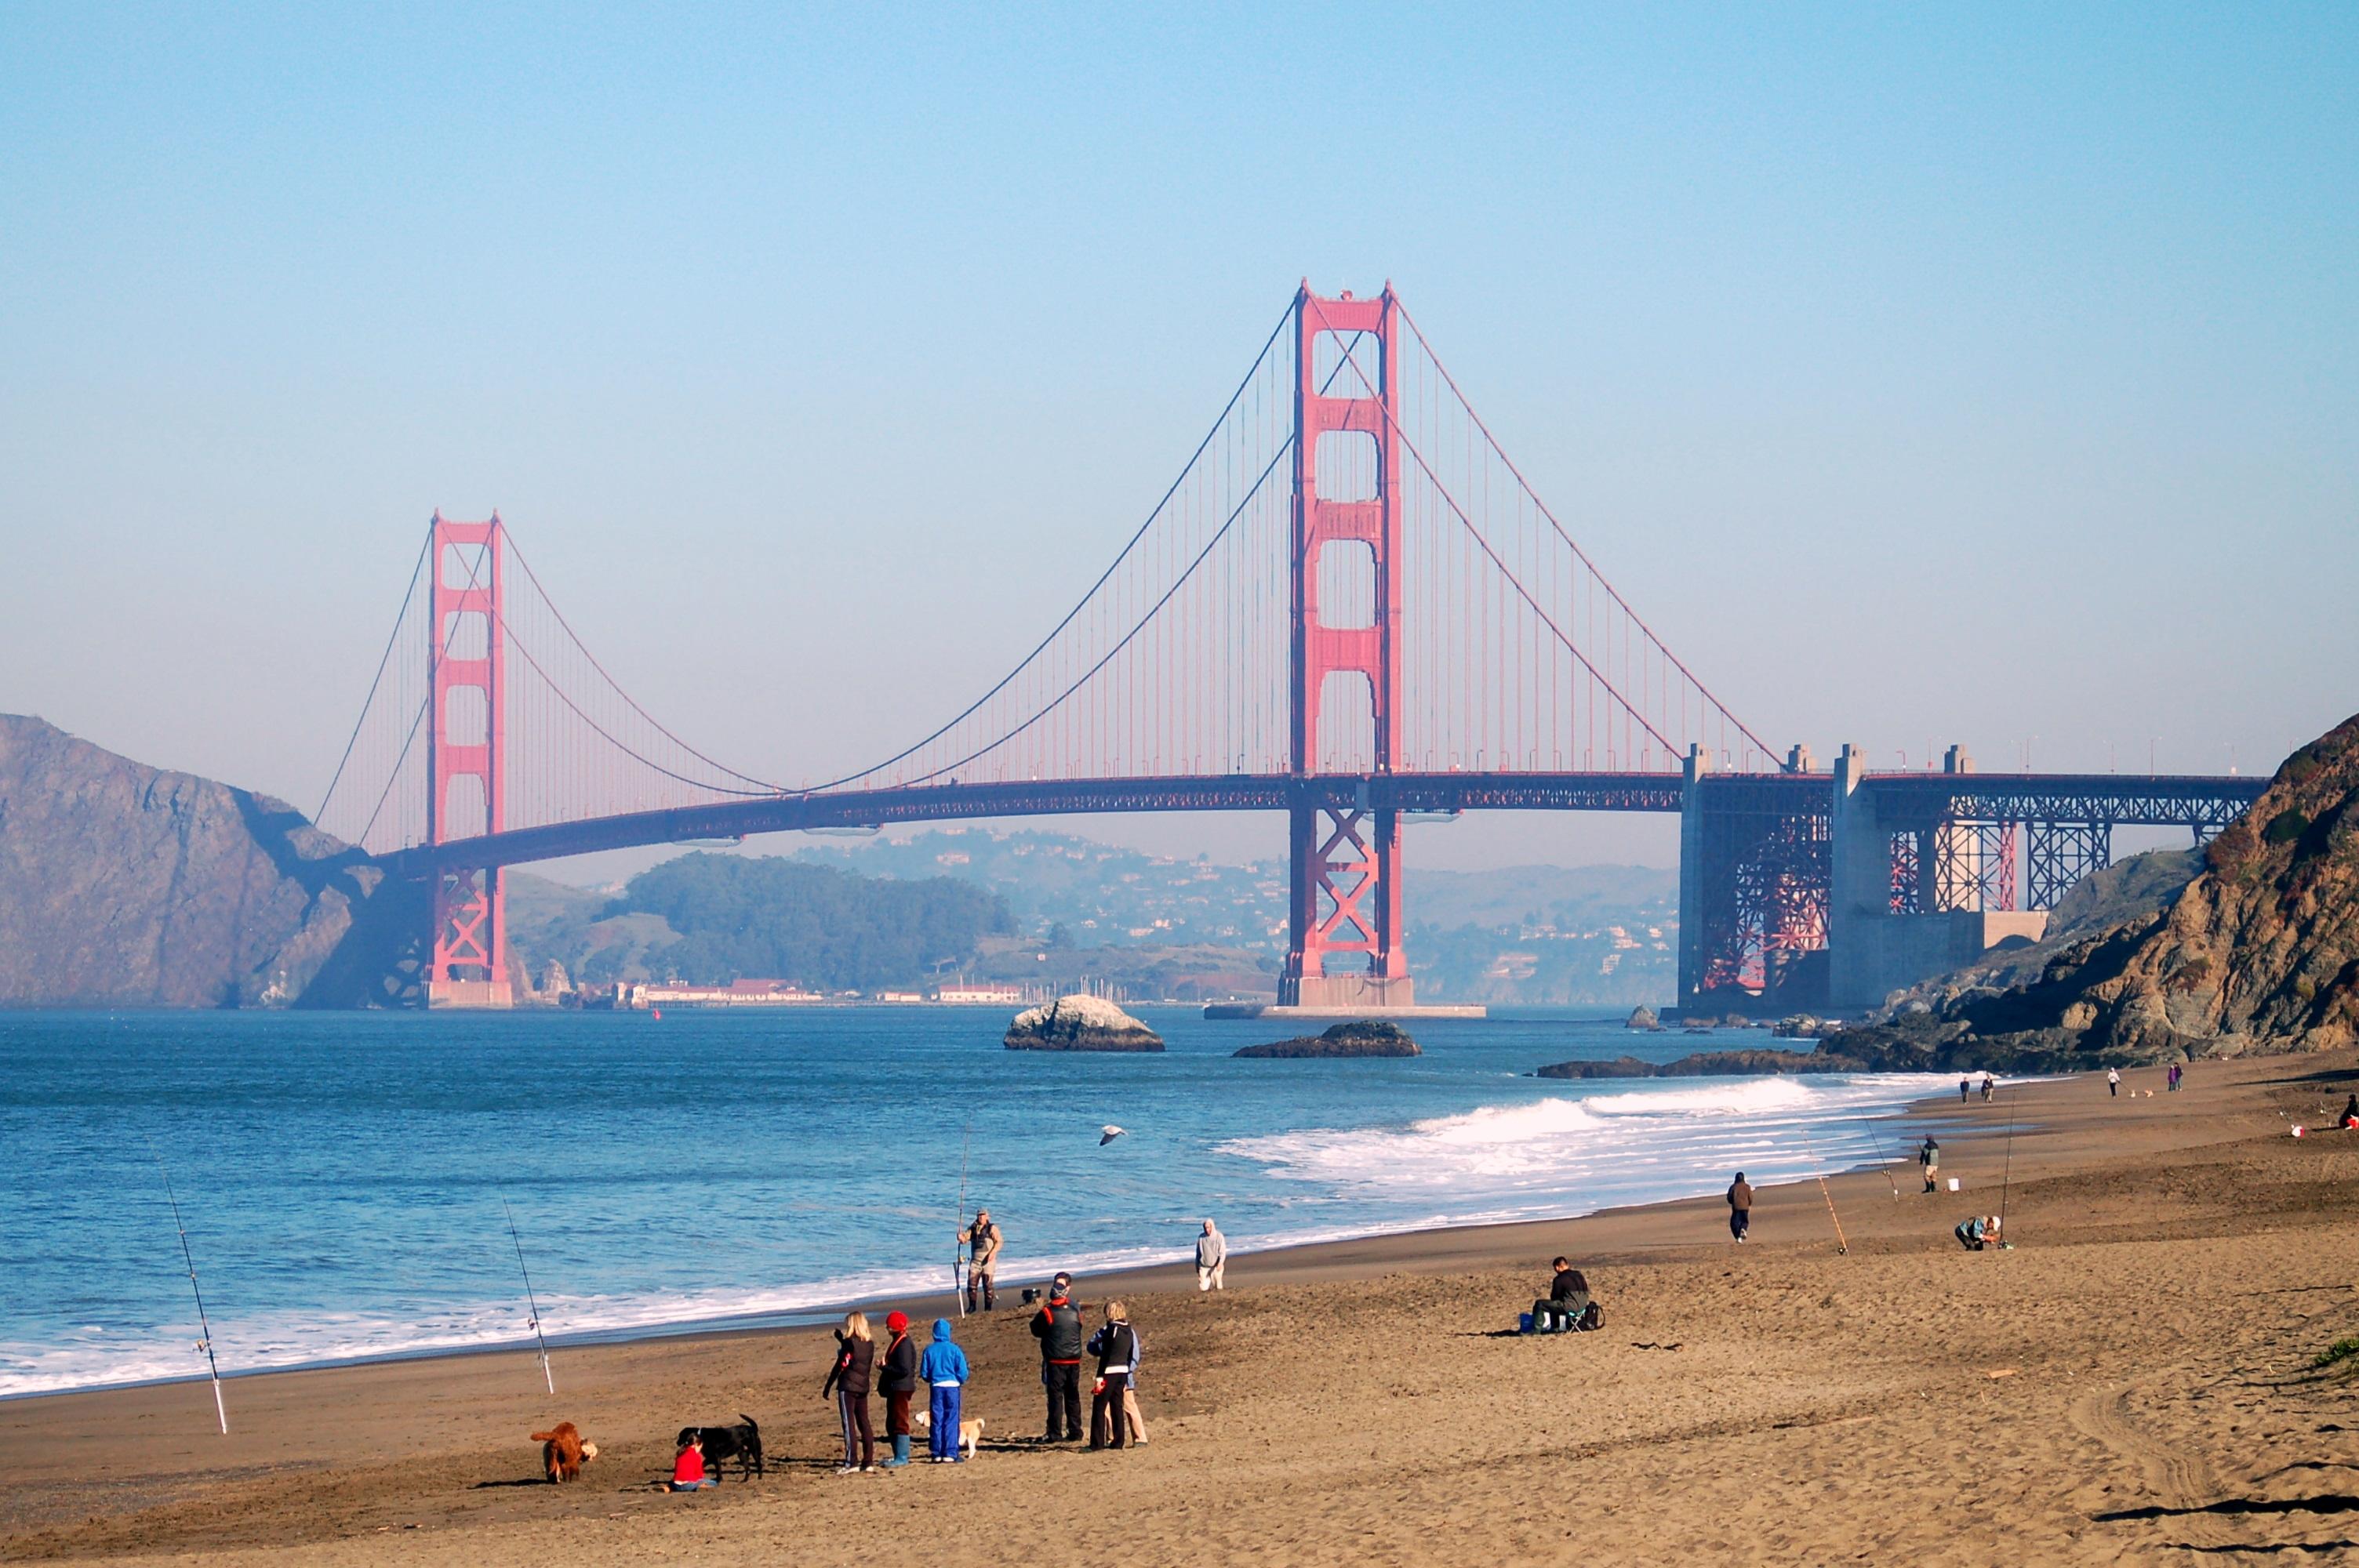 Baker Beach, San Francisco stock photo. Image of sand